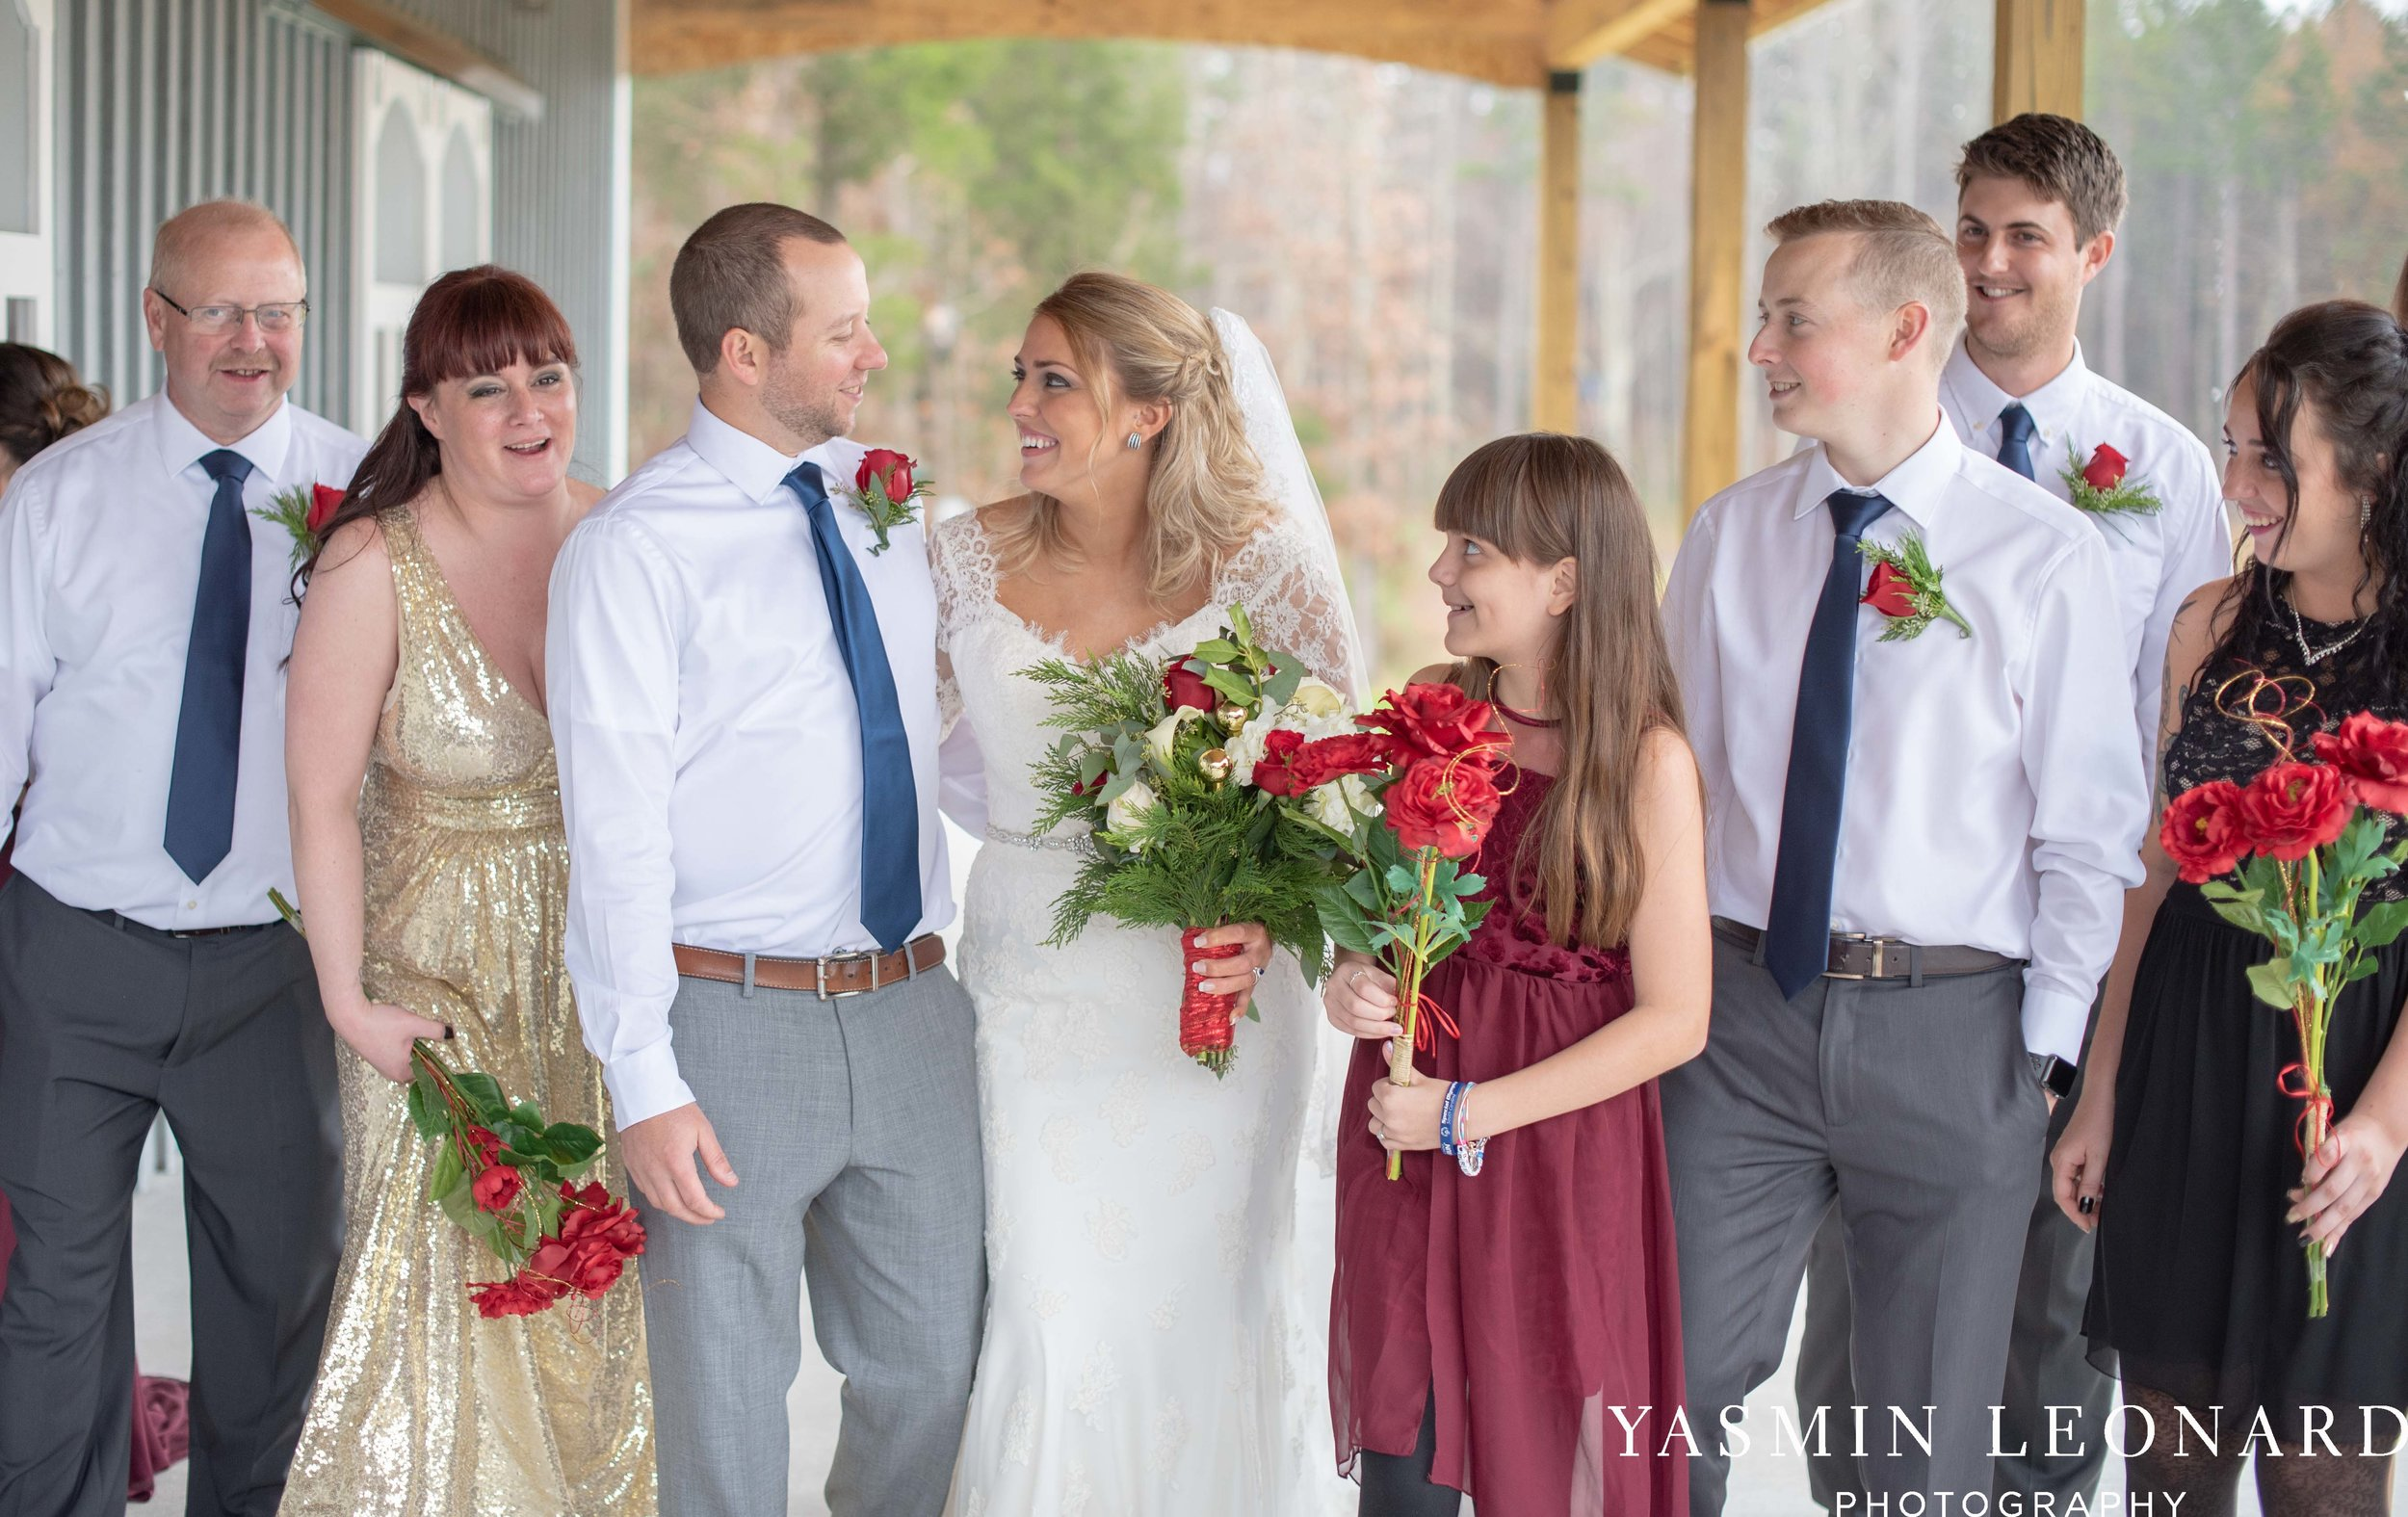 Secret Meadows at Green Dell Farm, NC Barns, NC Wedding Venues, Triad, NC, NC Wedding Photography, Triad Wedding Venues, Affordable Wedding Venues, NEW Wedding Venues, Christmas Weddings-24.jpg